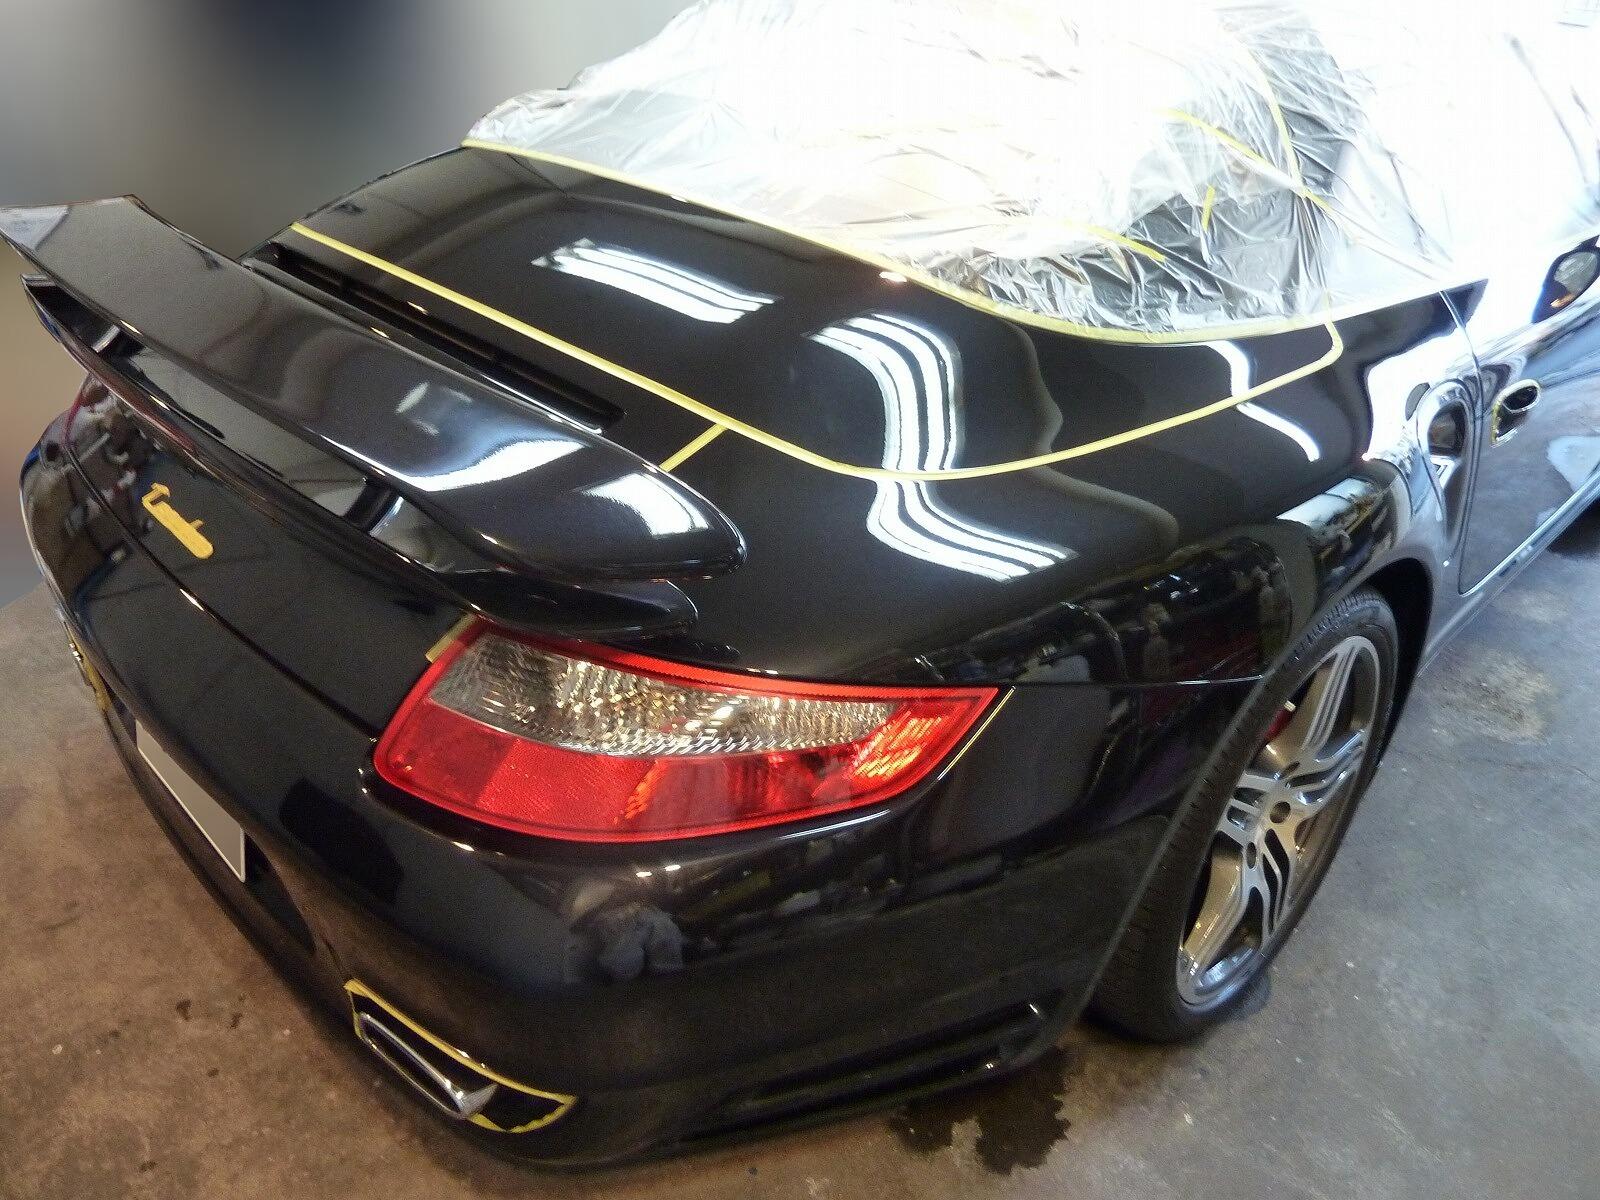 20140402-porsche-911-turbo-04